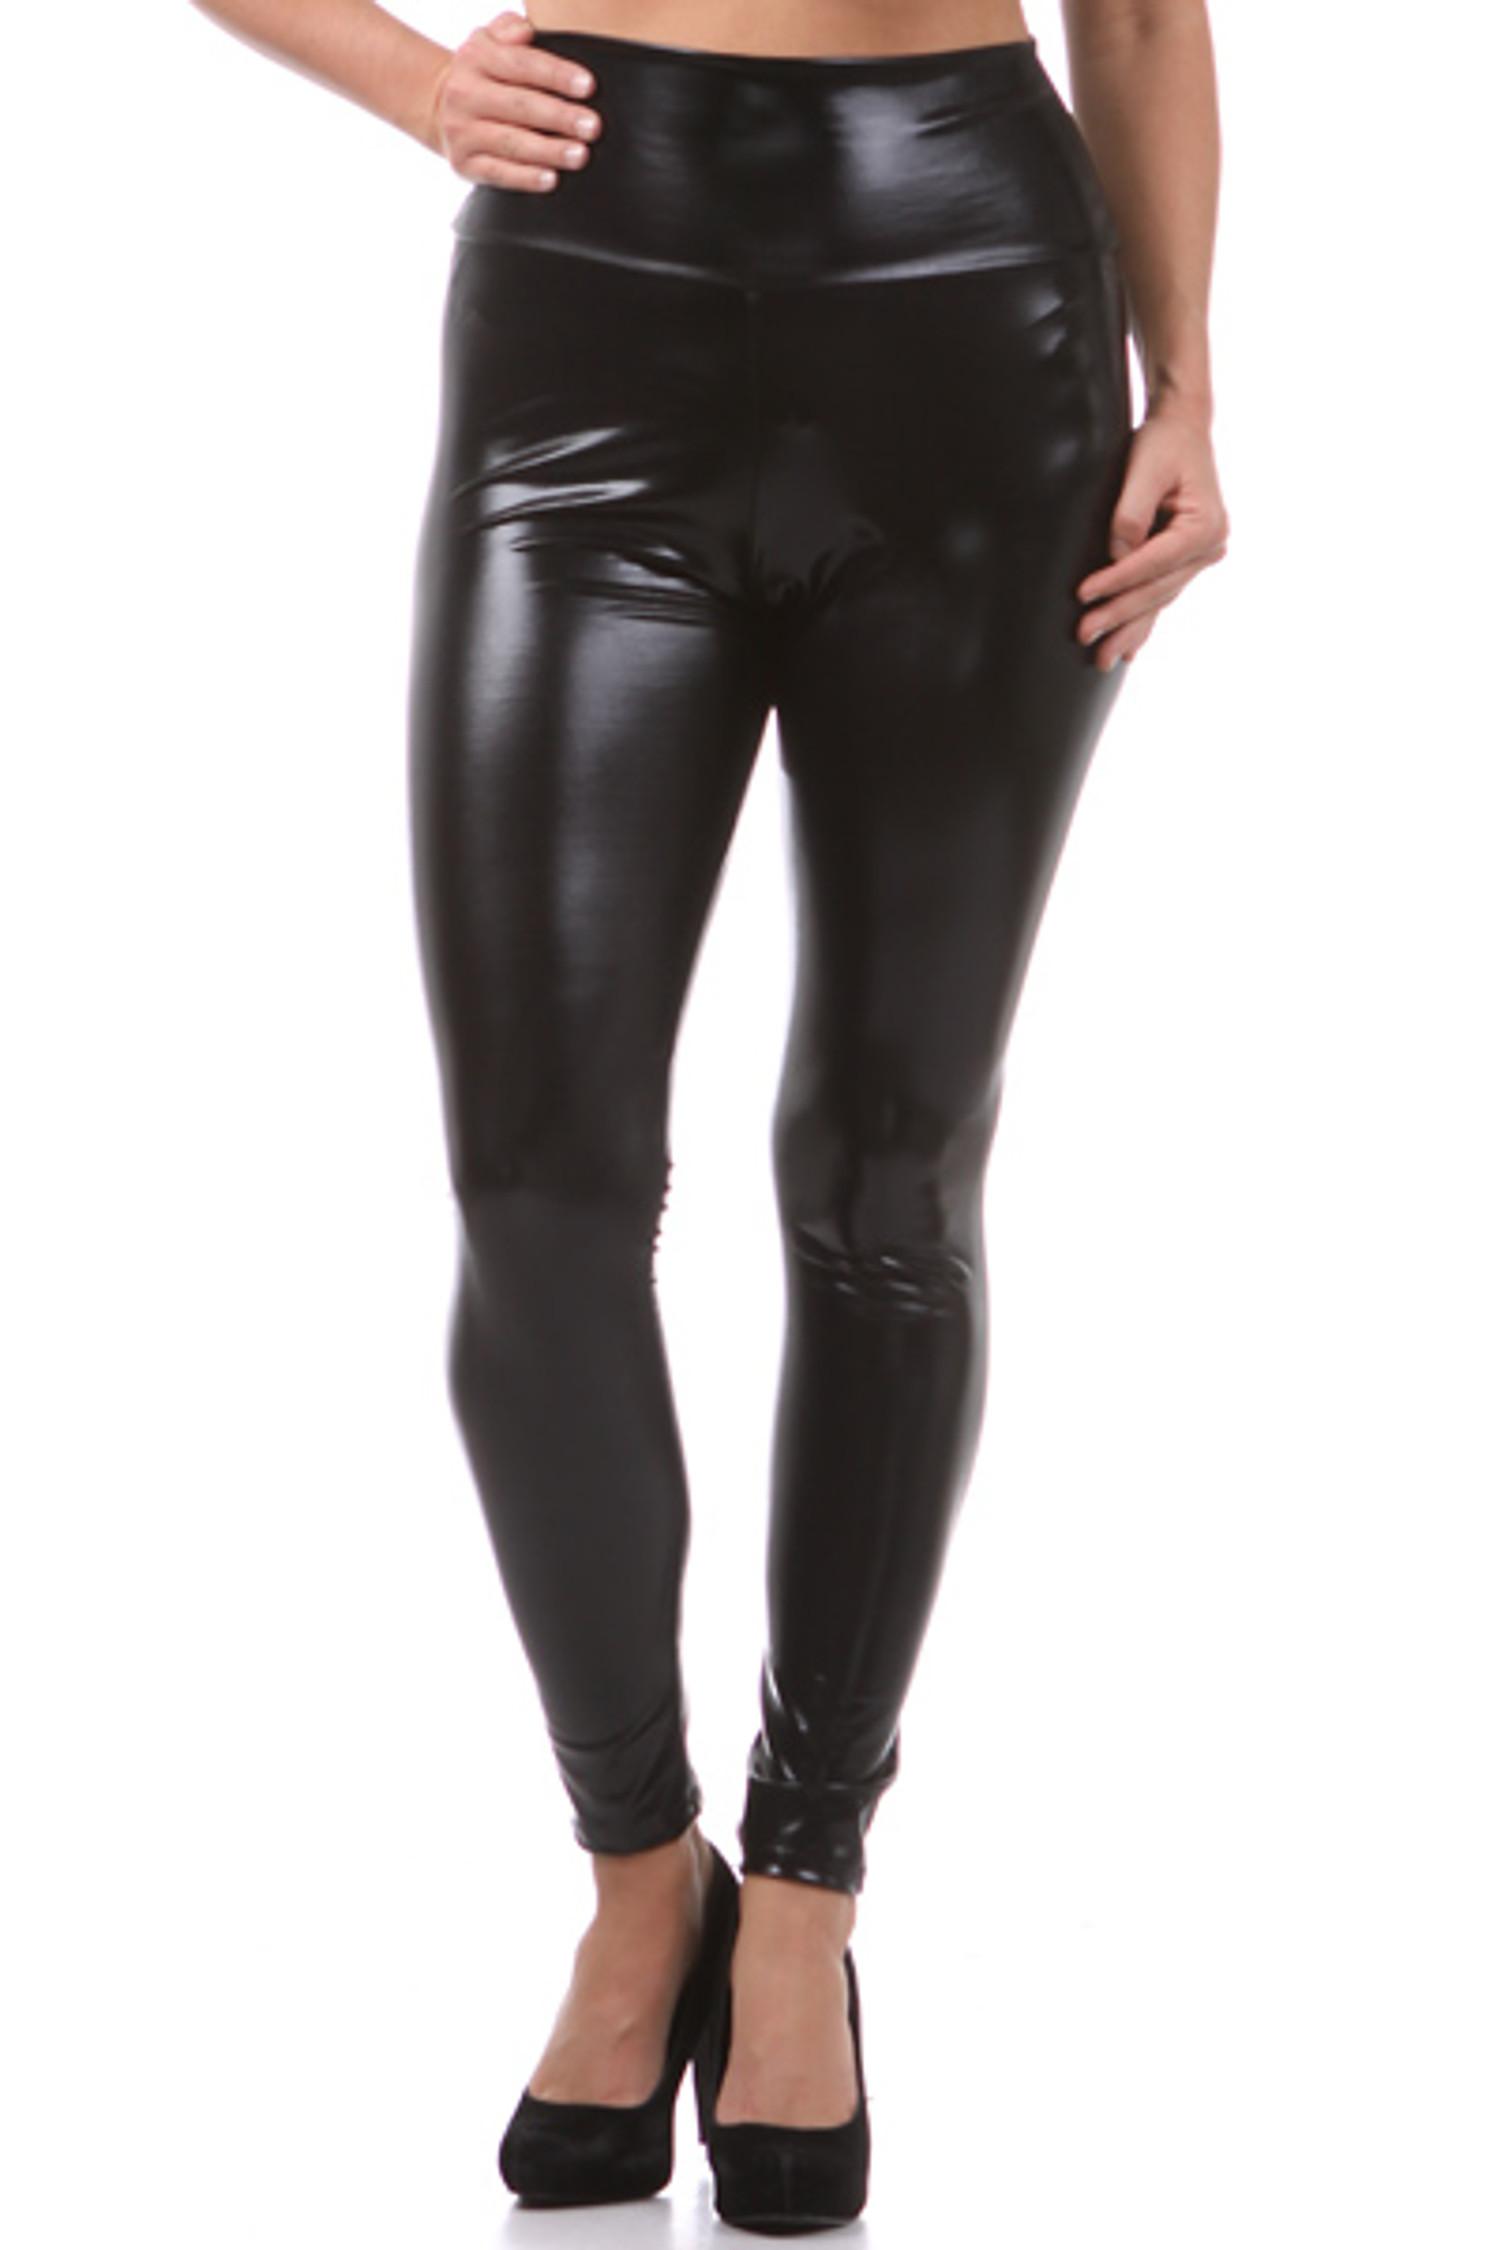 Shiny Black High Waisted Faux Leather Plus Size leggings